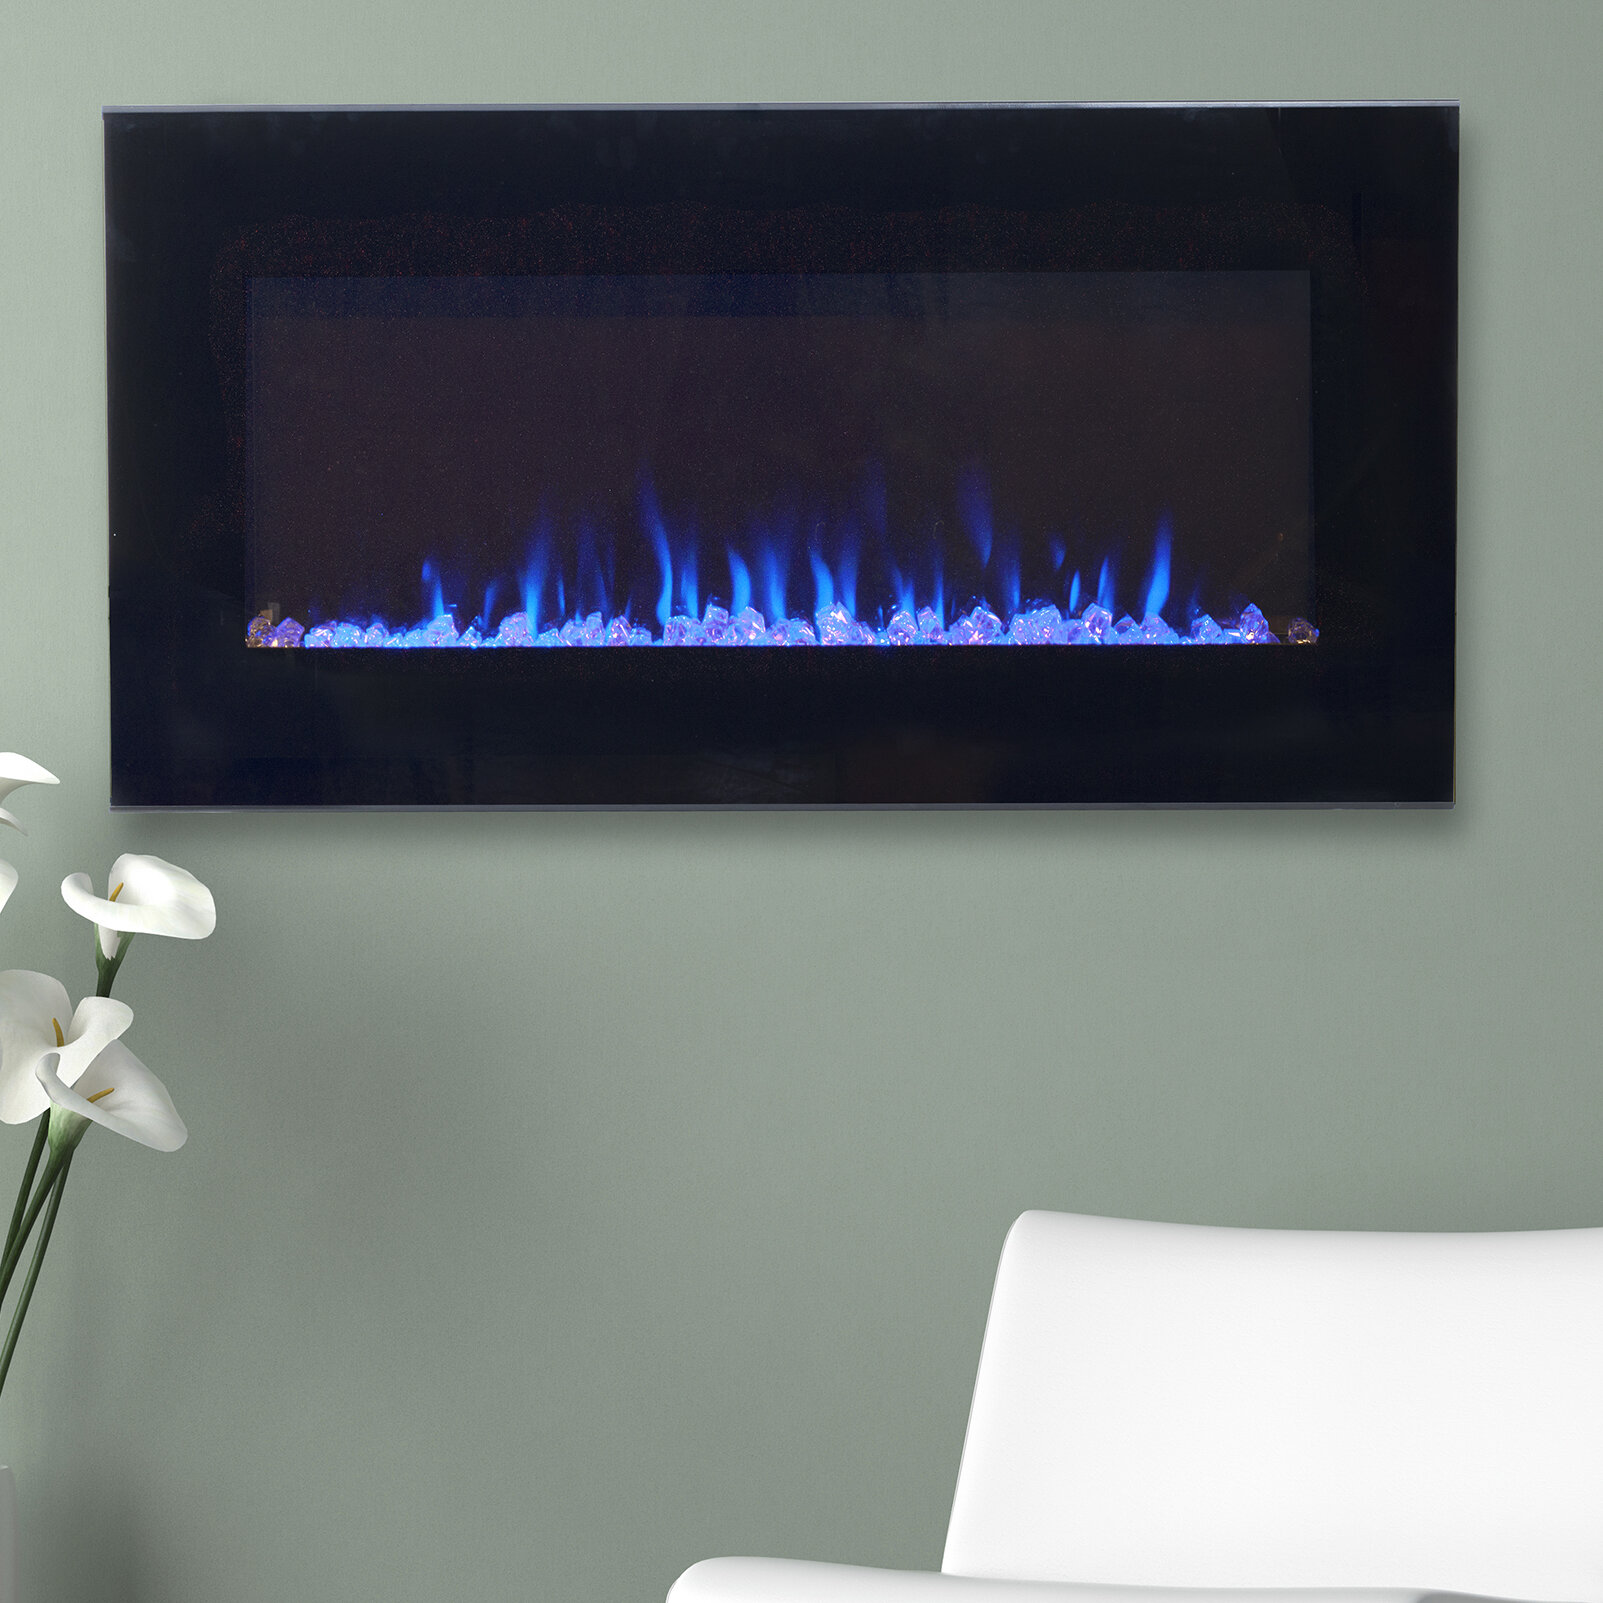 Phenomenal Amish Fireplace Wayfair Download Free Architecture Designs Intelgarnamadebymaigaardcom